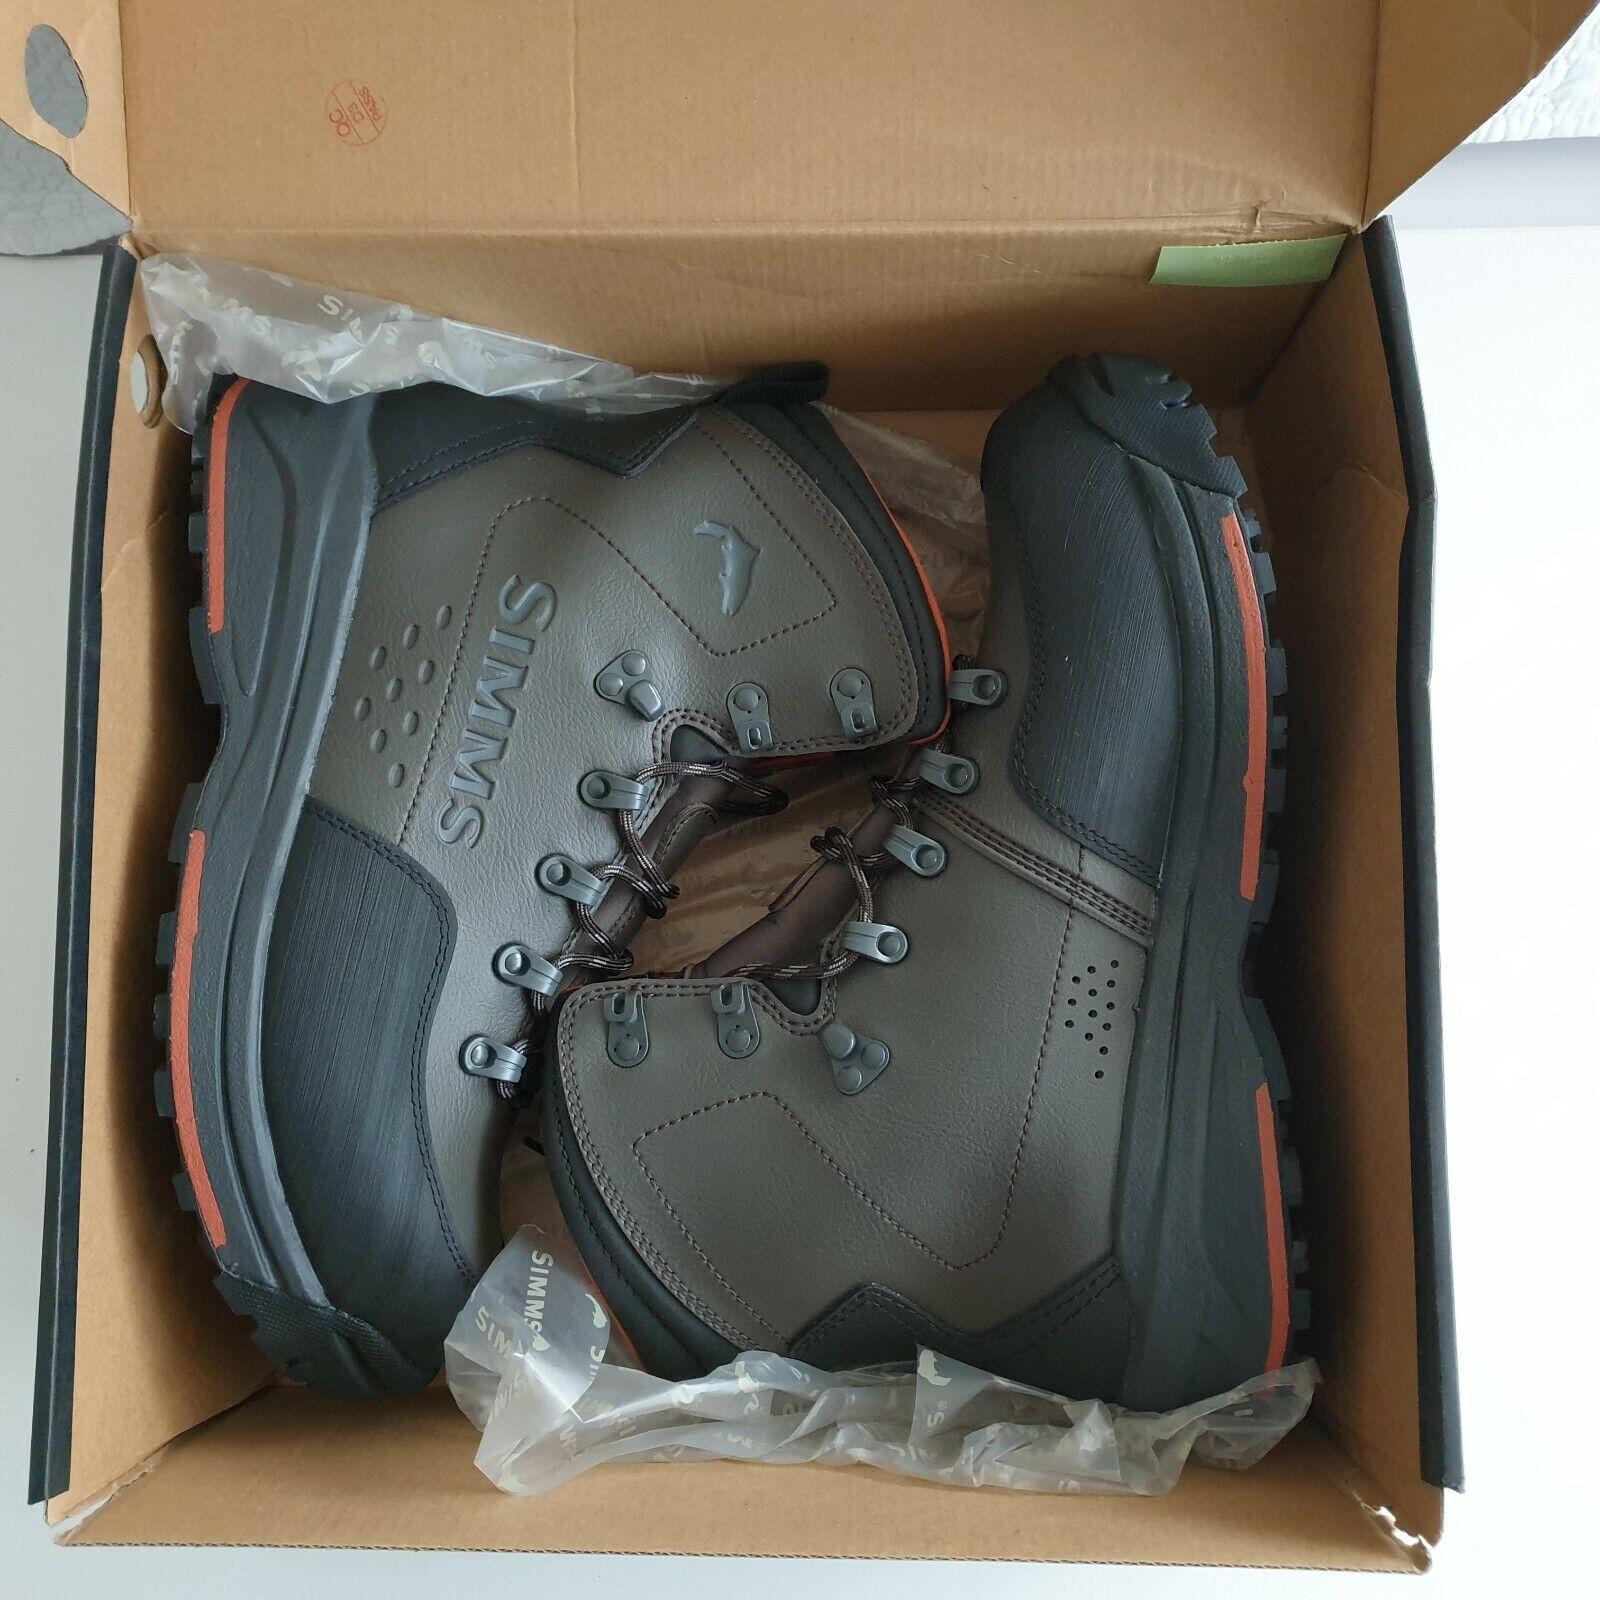 Grandeslam Four Seasons Terrain Bank Boots Fishing Hiking Walking Boots Size 10